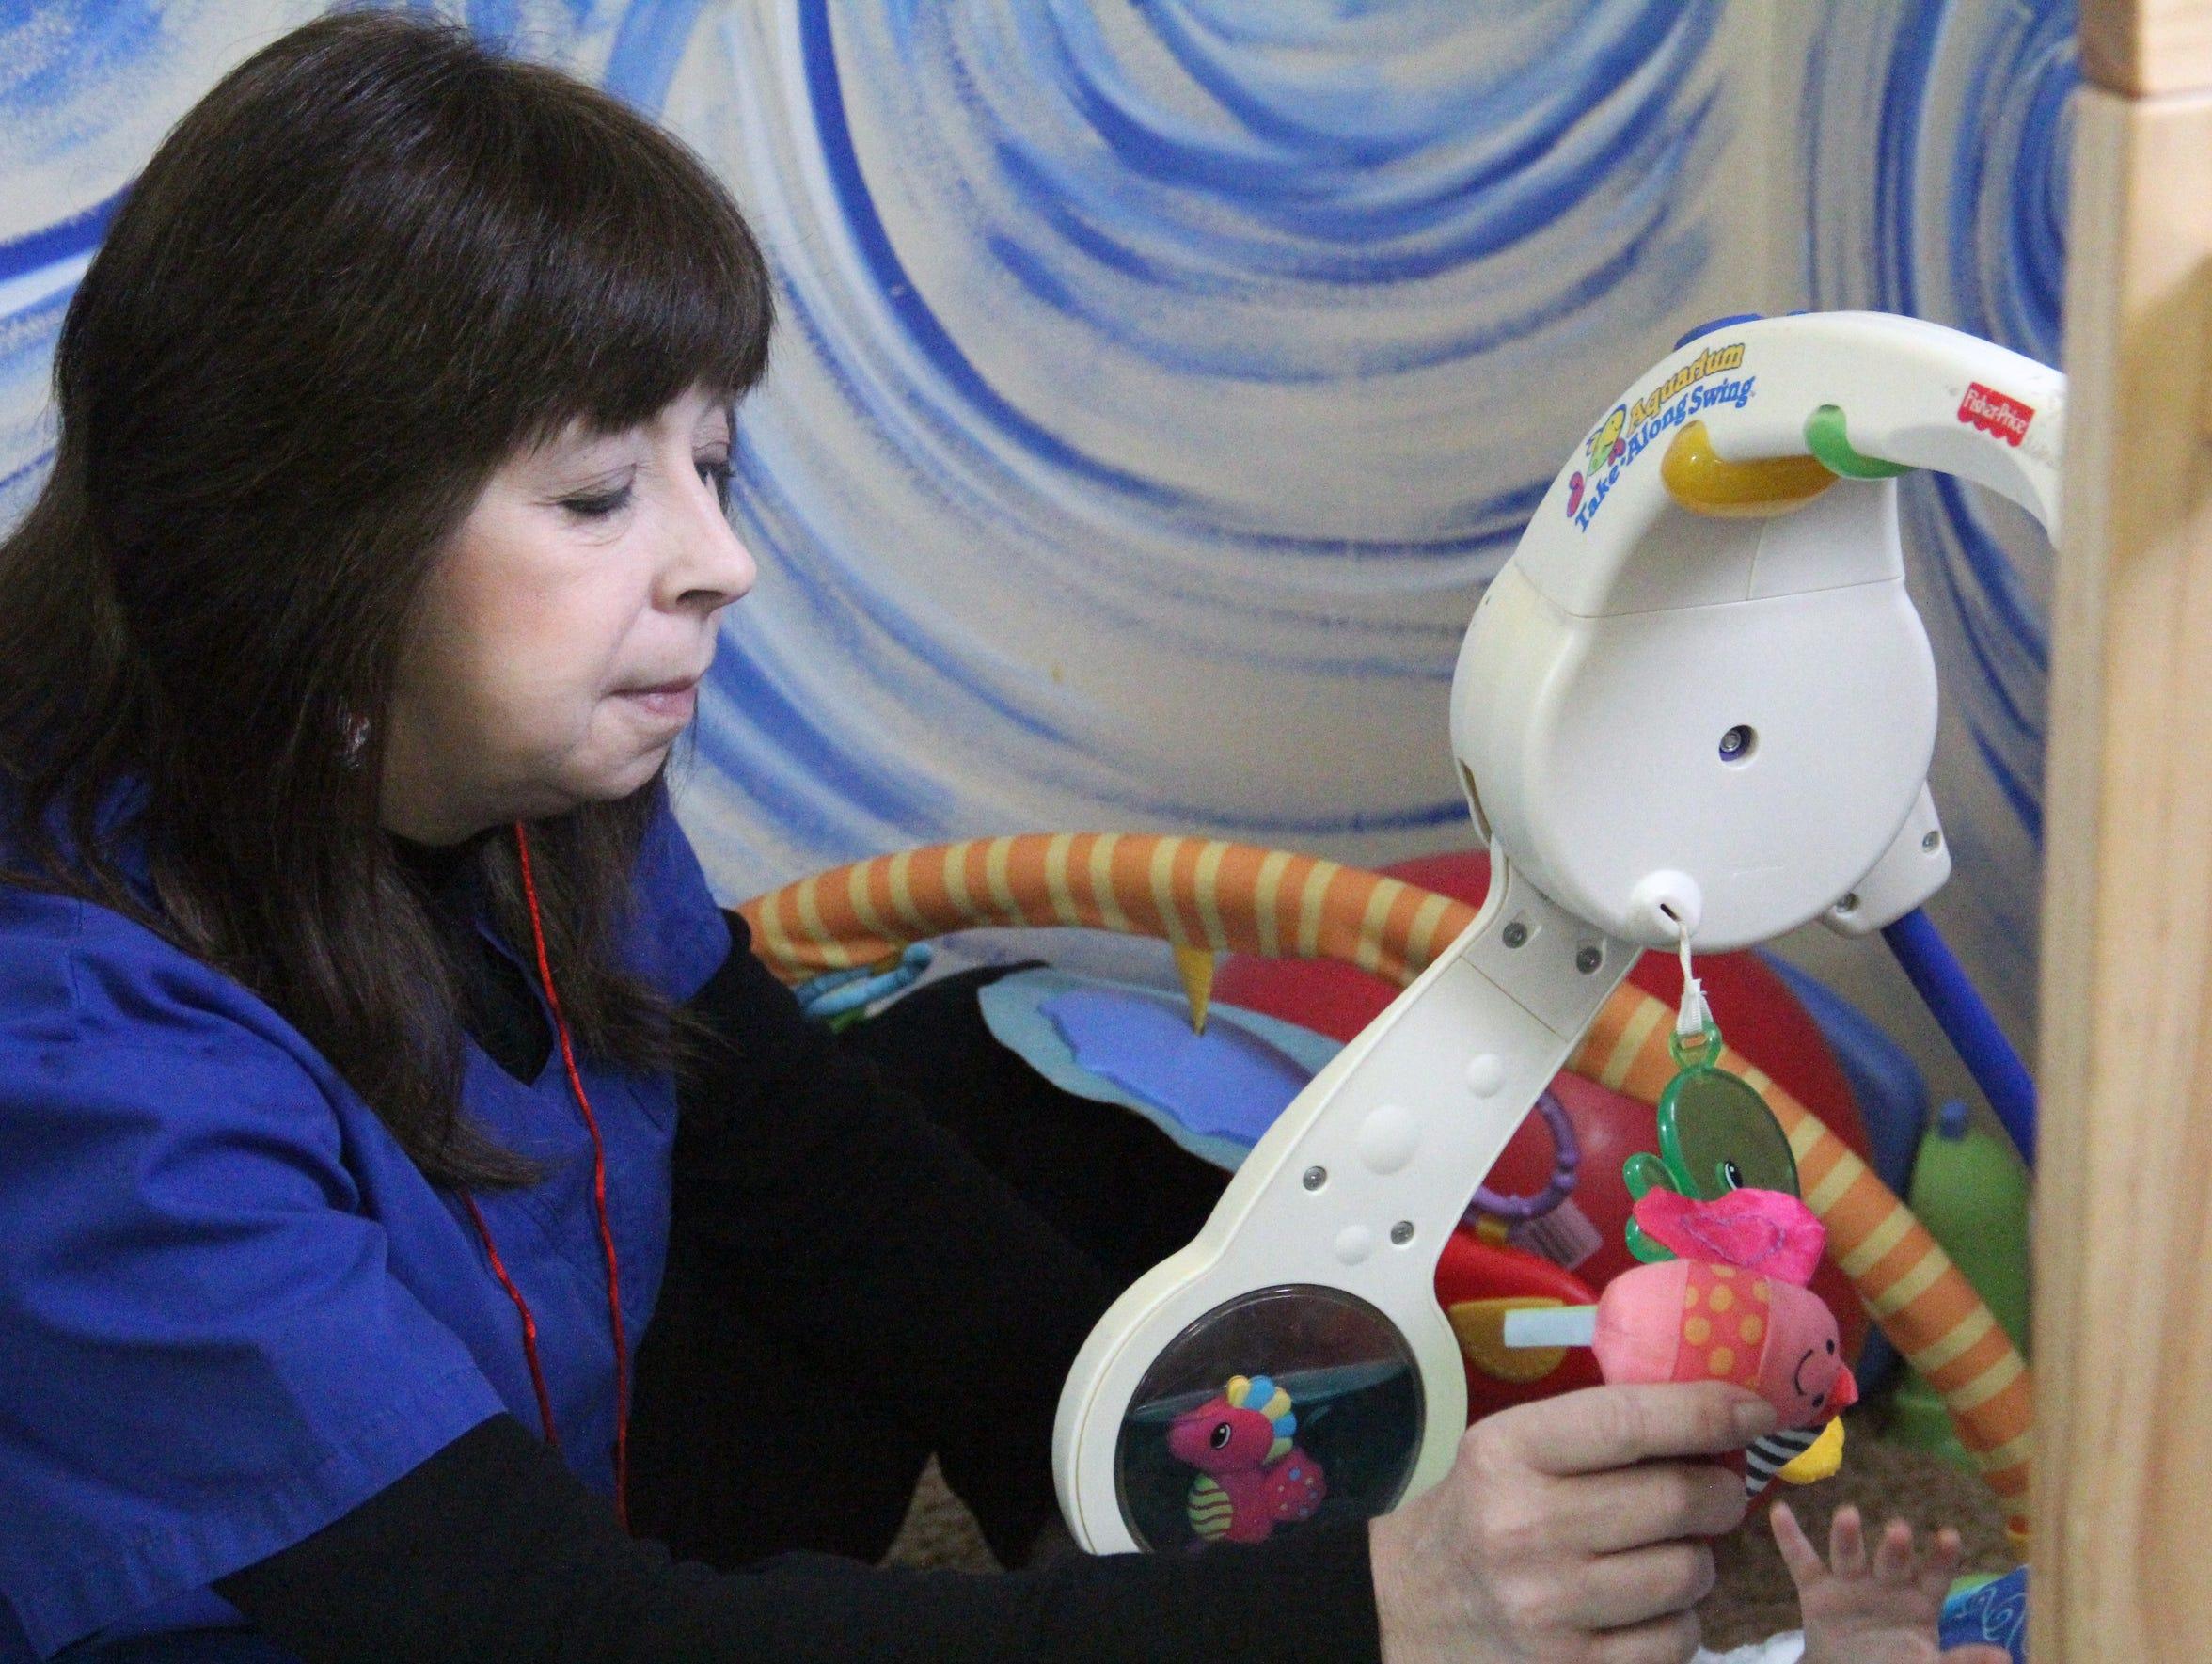 Sherry Middleton, a caregiver at Porter's Chapel Daycare